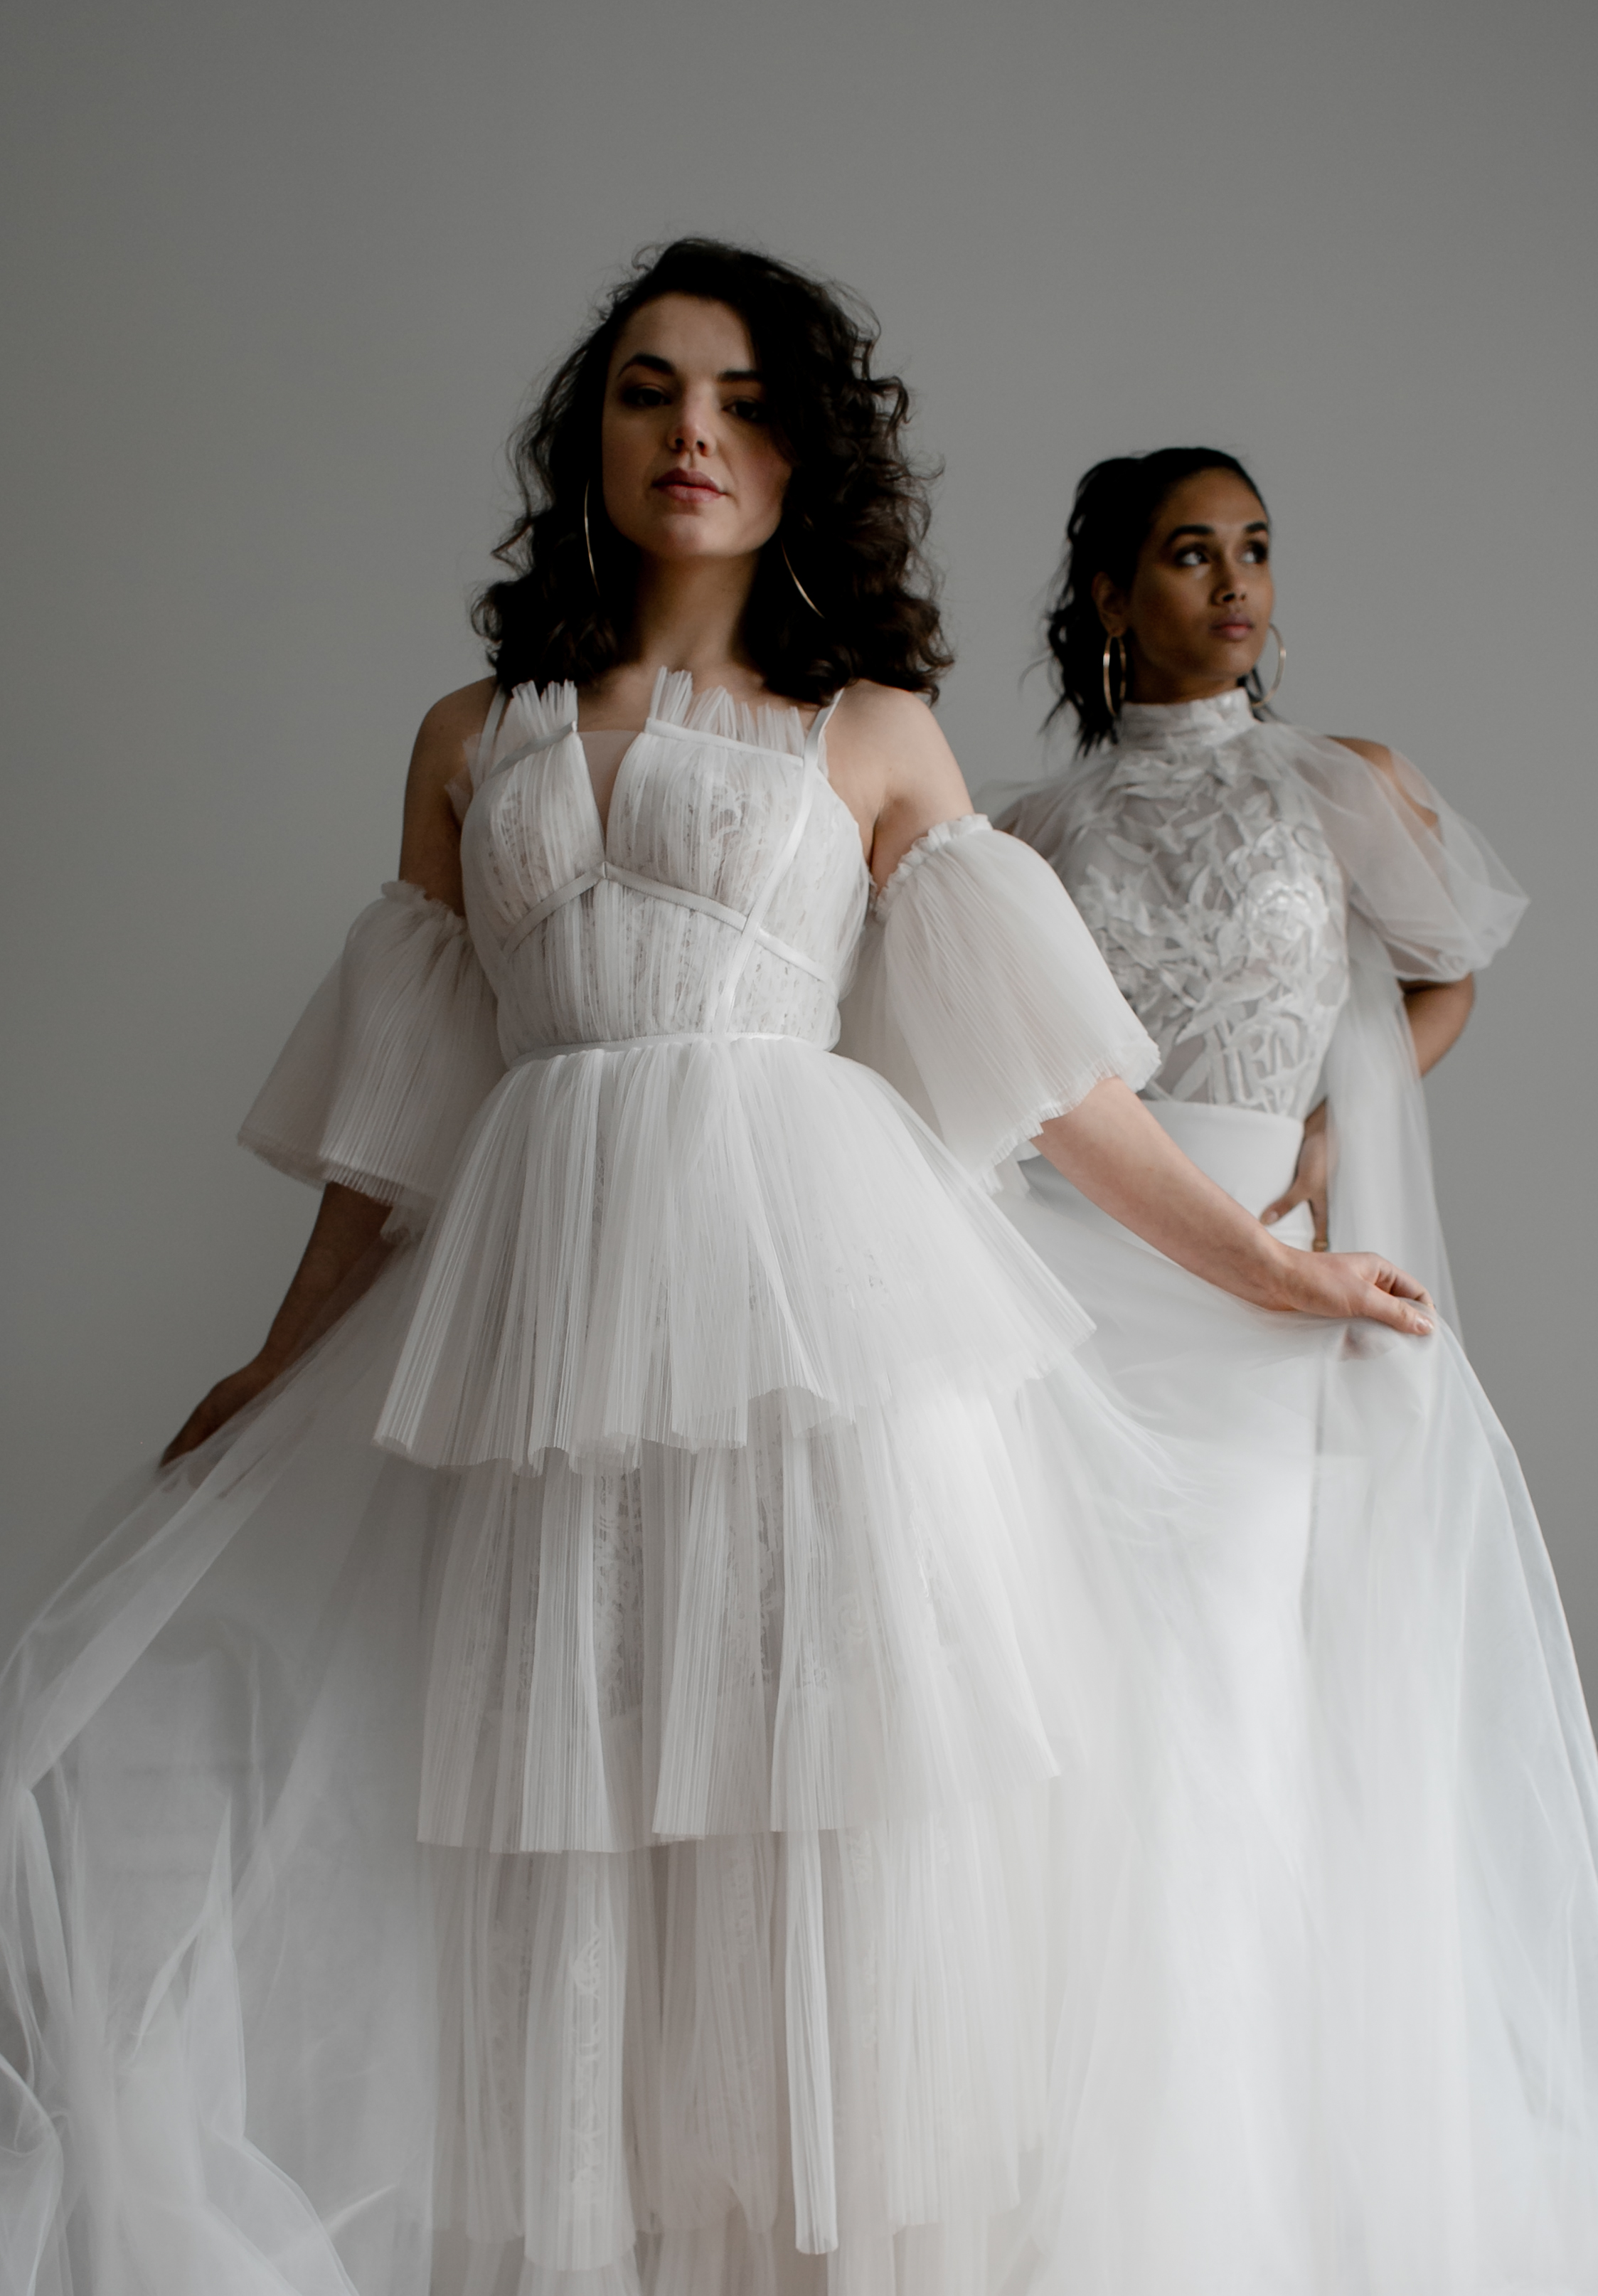 Chicago-Bride-Wedding-Dress-Varca-Edited-378.jpg